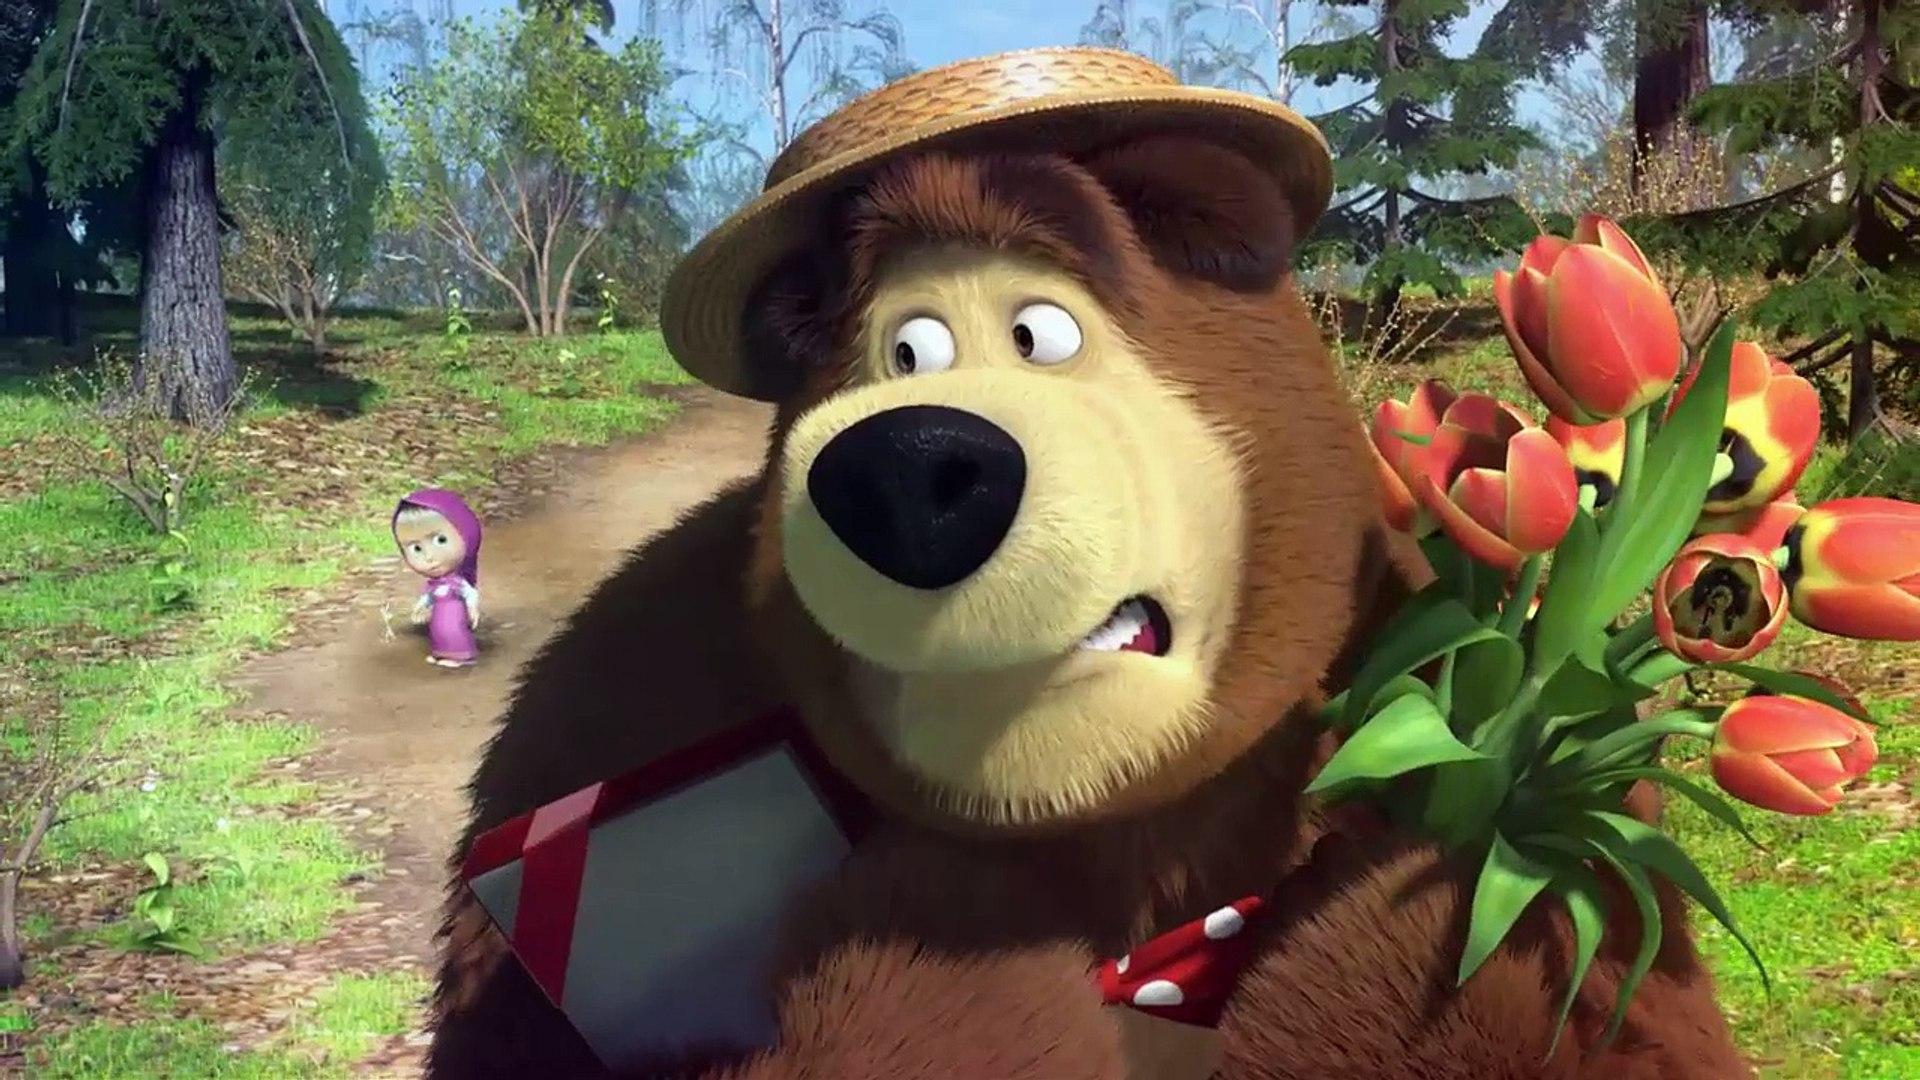 Masha E O Urso Episodio 7 Primavera Para O Urso Video Dailymotion